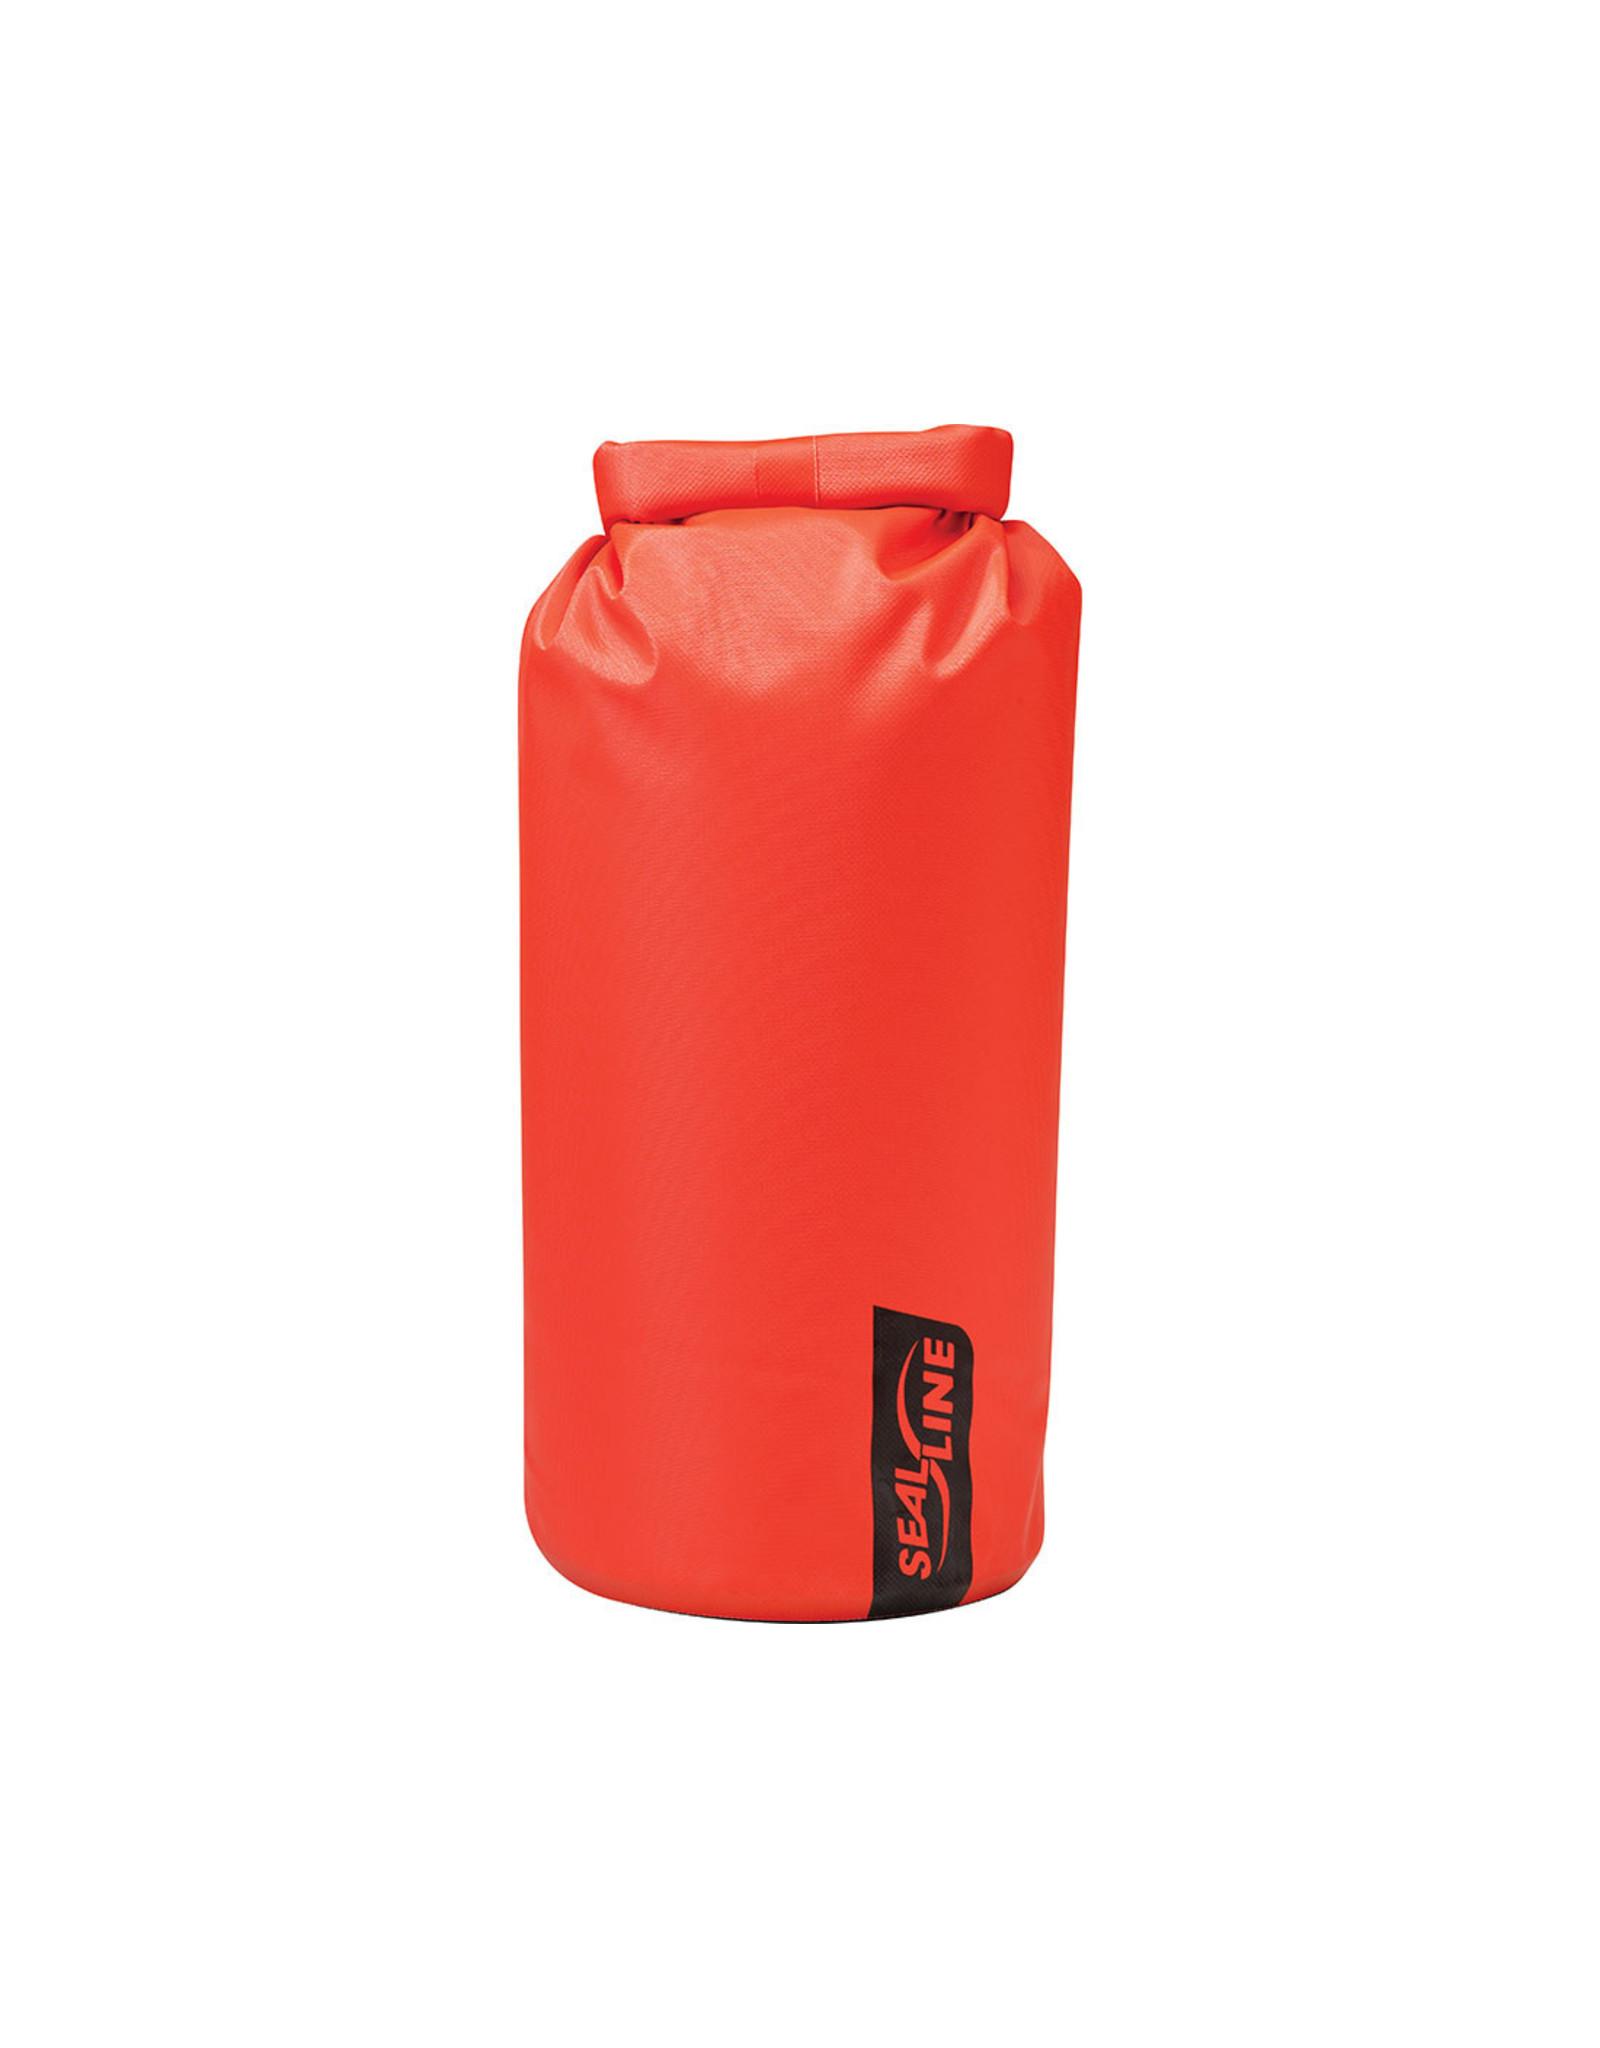 SealLine SealLine 20L Baja Dry Bag S19